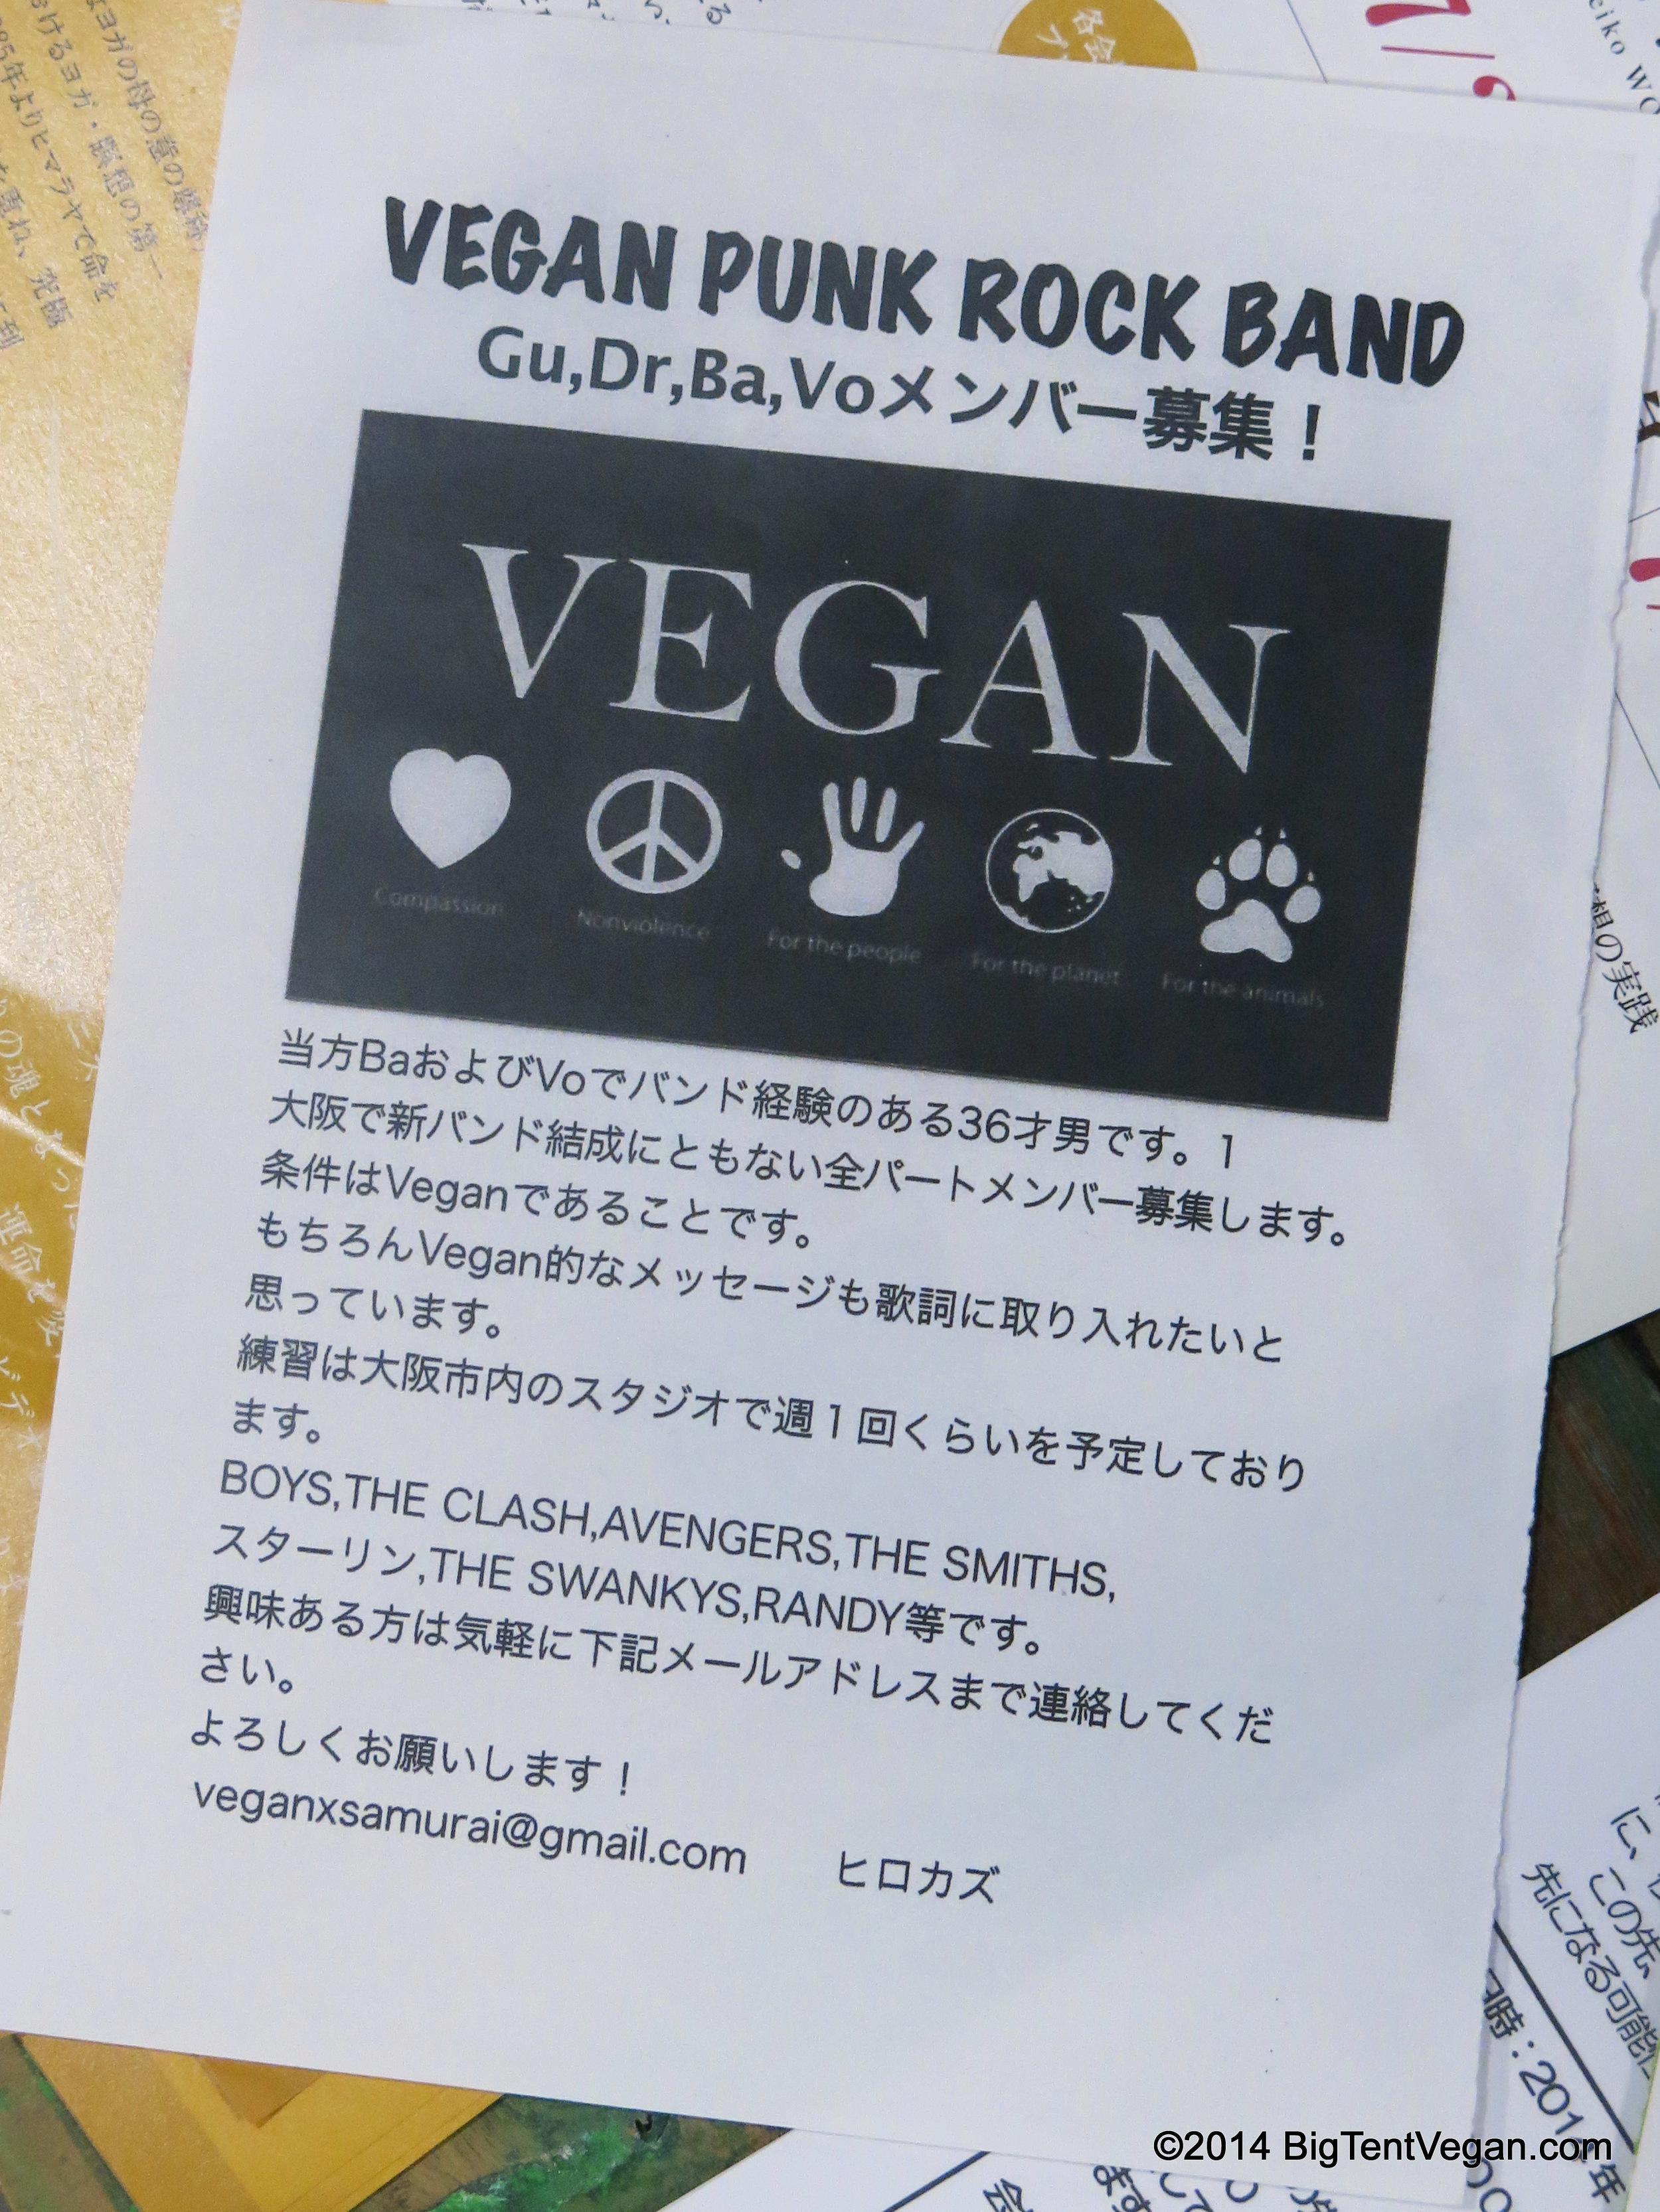 Flyer we spotted at Vegans Café       12.00        and Restaurant for a Vegan Punk Rock Band